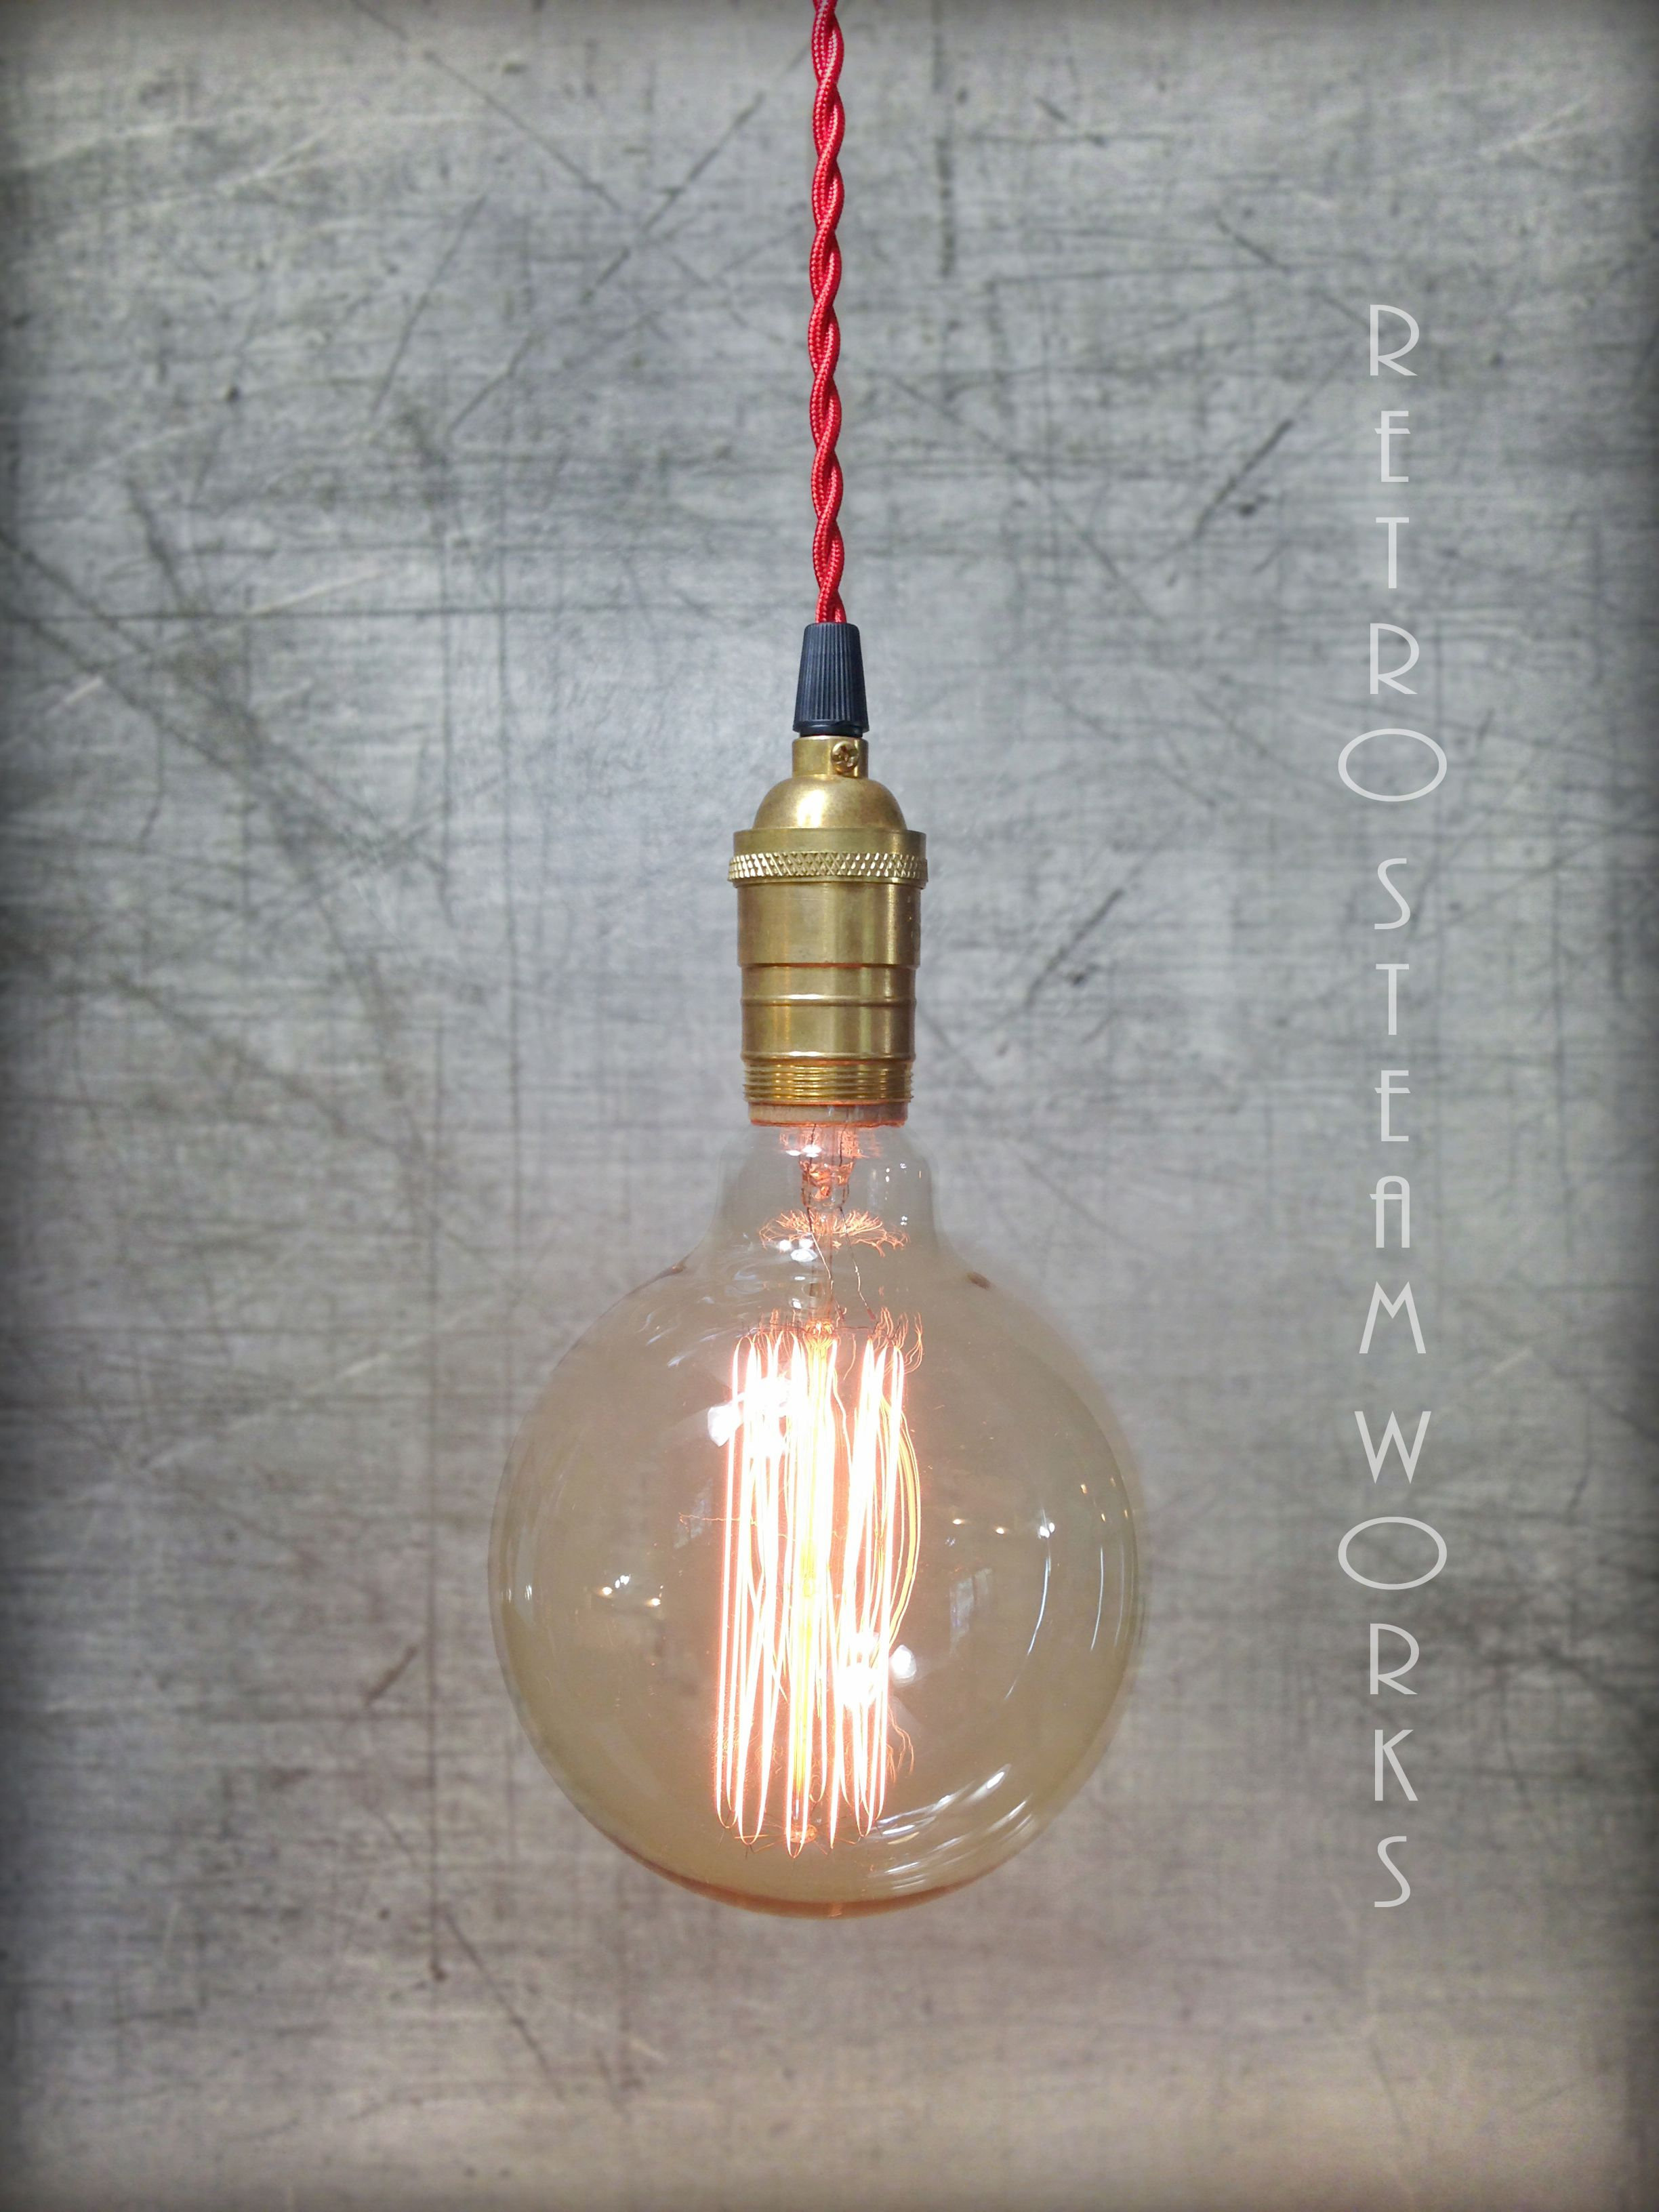 Hand made bare edison bulb industrial loft pendant light plug in or custom made bare edison bulb industrial loft pendant light plug in or hardwired aloadofball Image collections